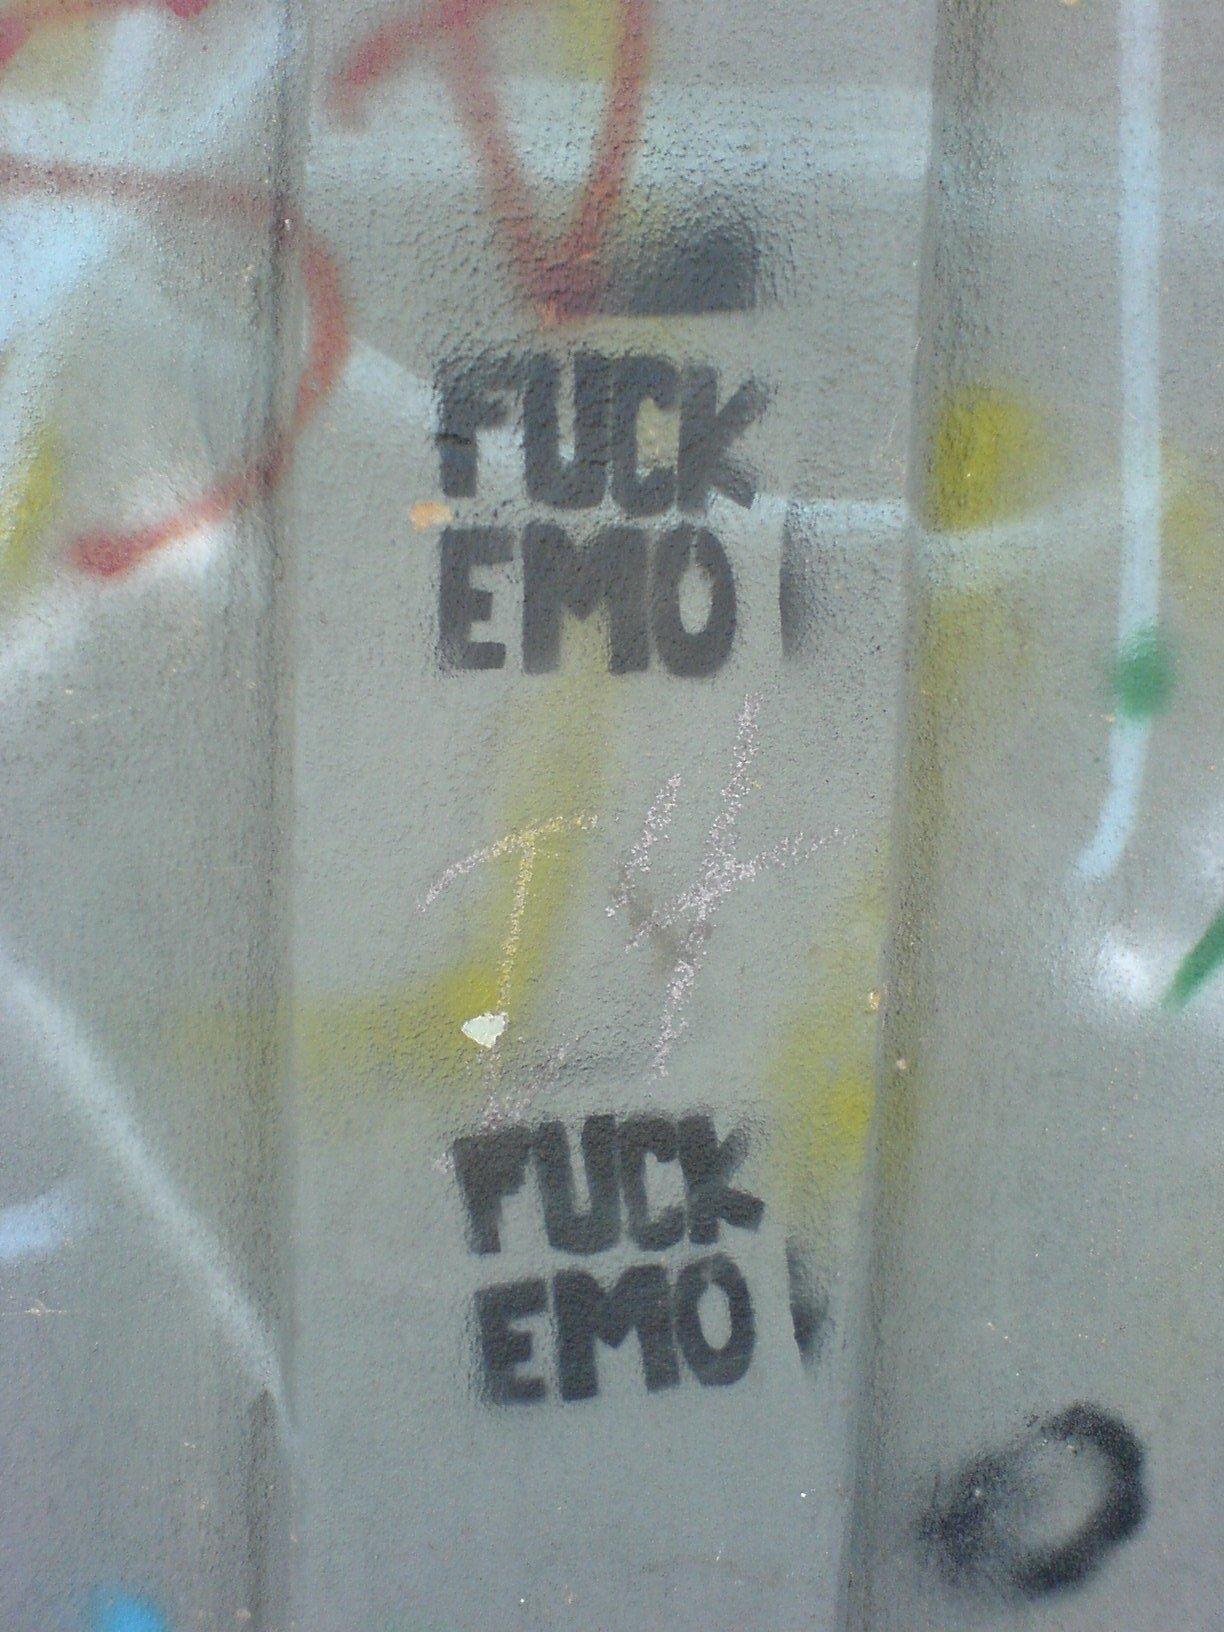 Emo music hub fandom powered by wikia malvernweather Choice Image